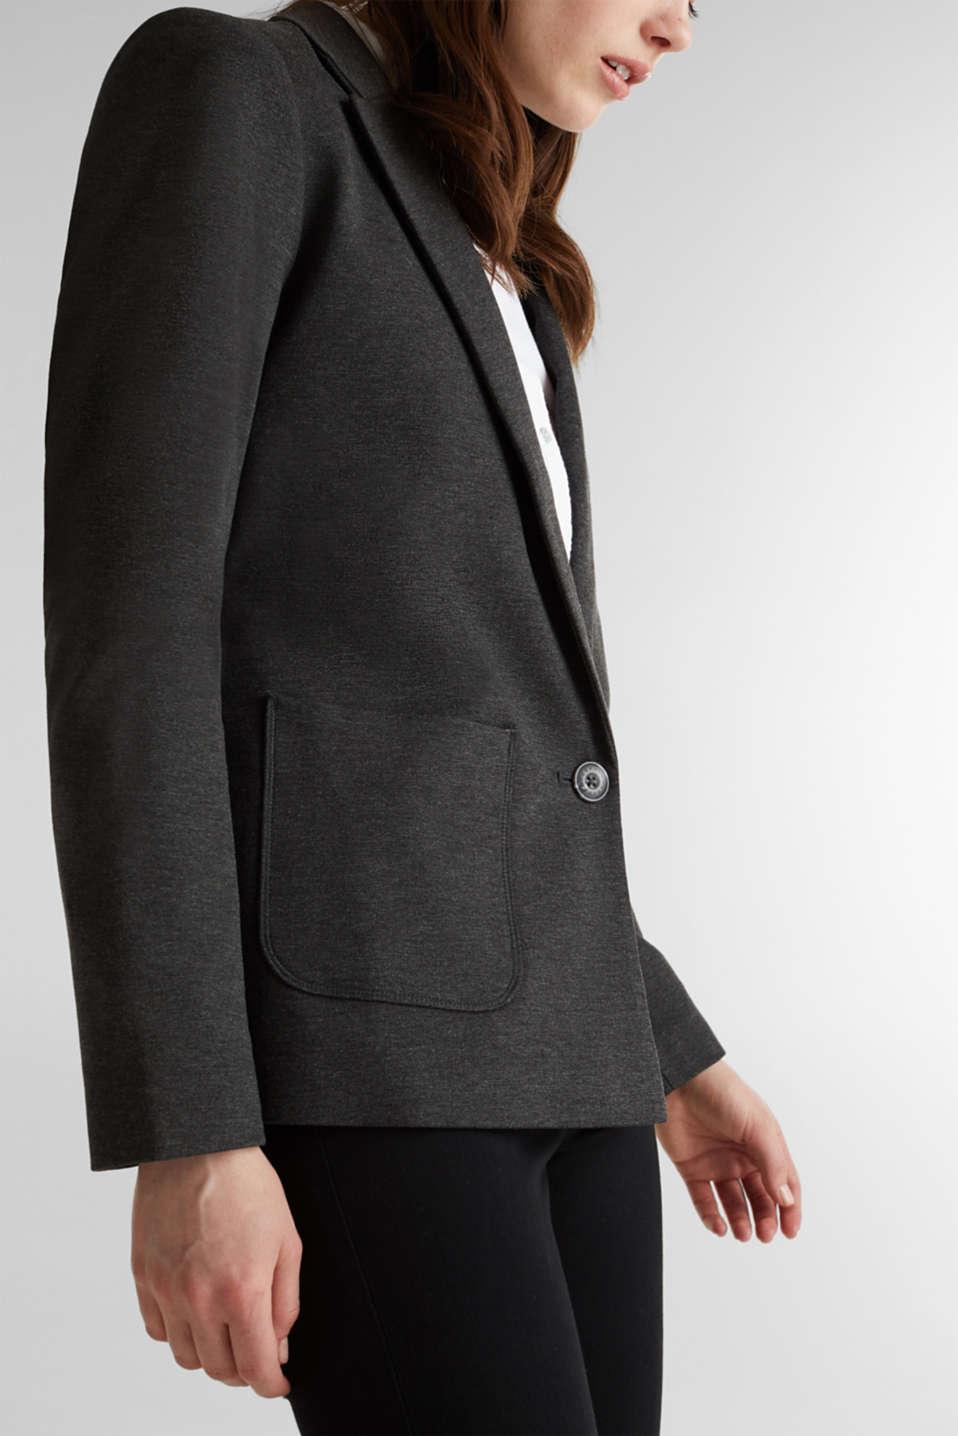 Stretch jersey blazer with pockets, DARK GREY, detail image number 2